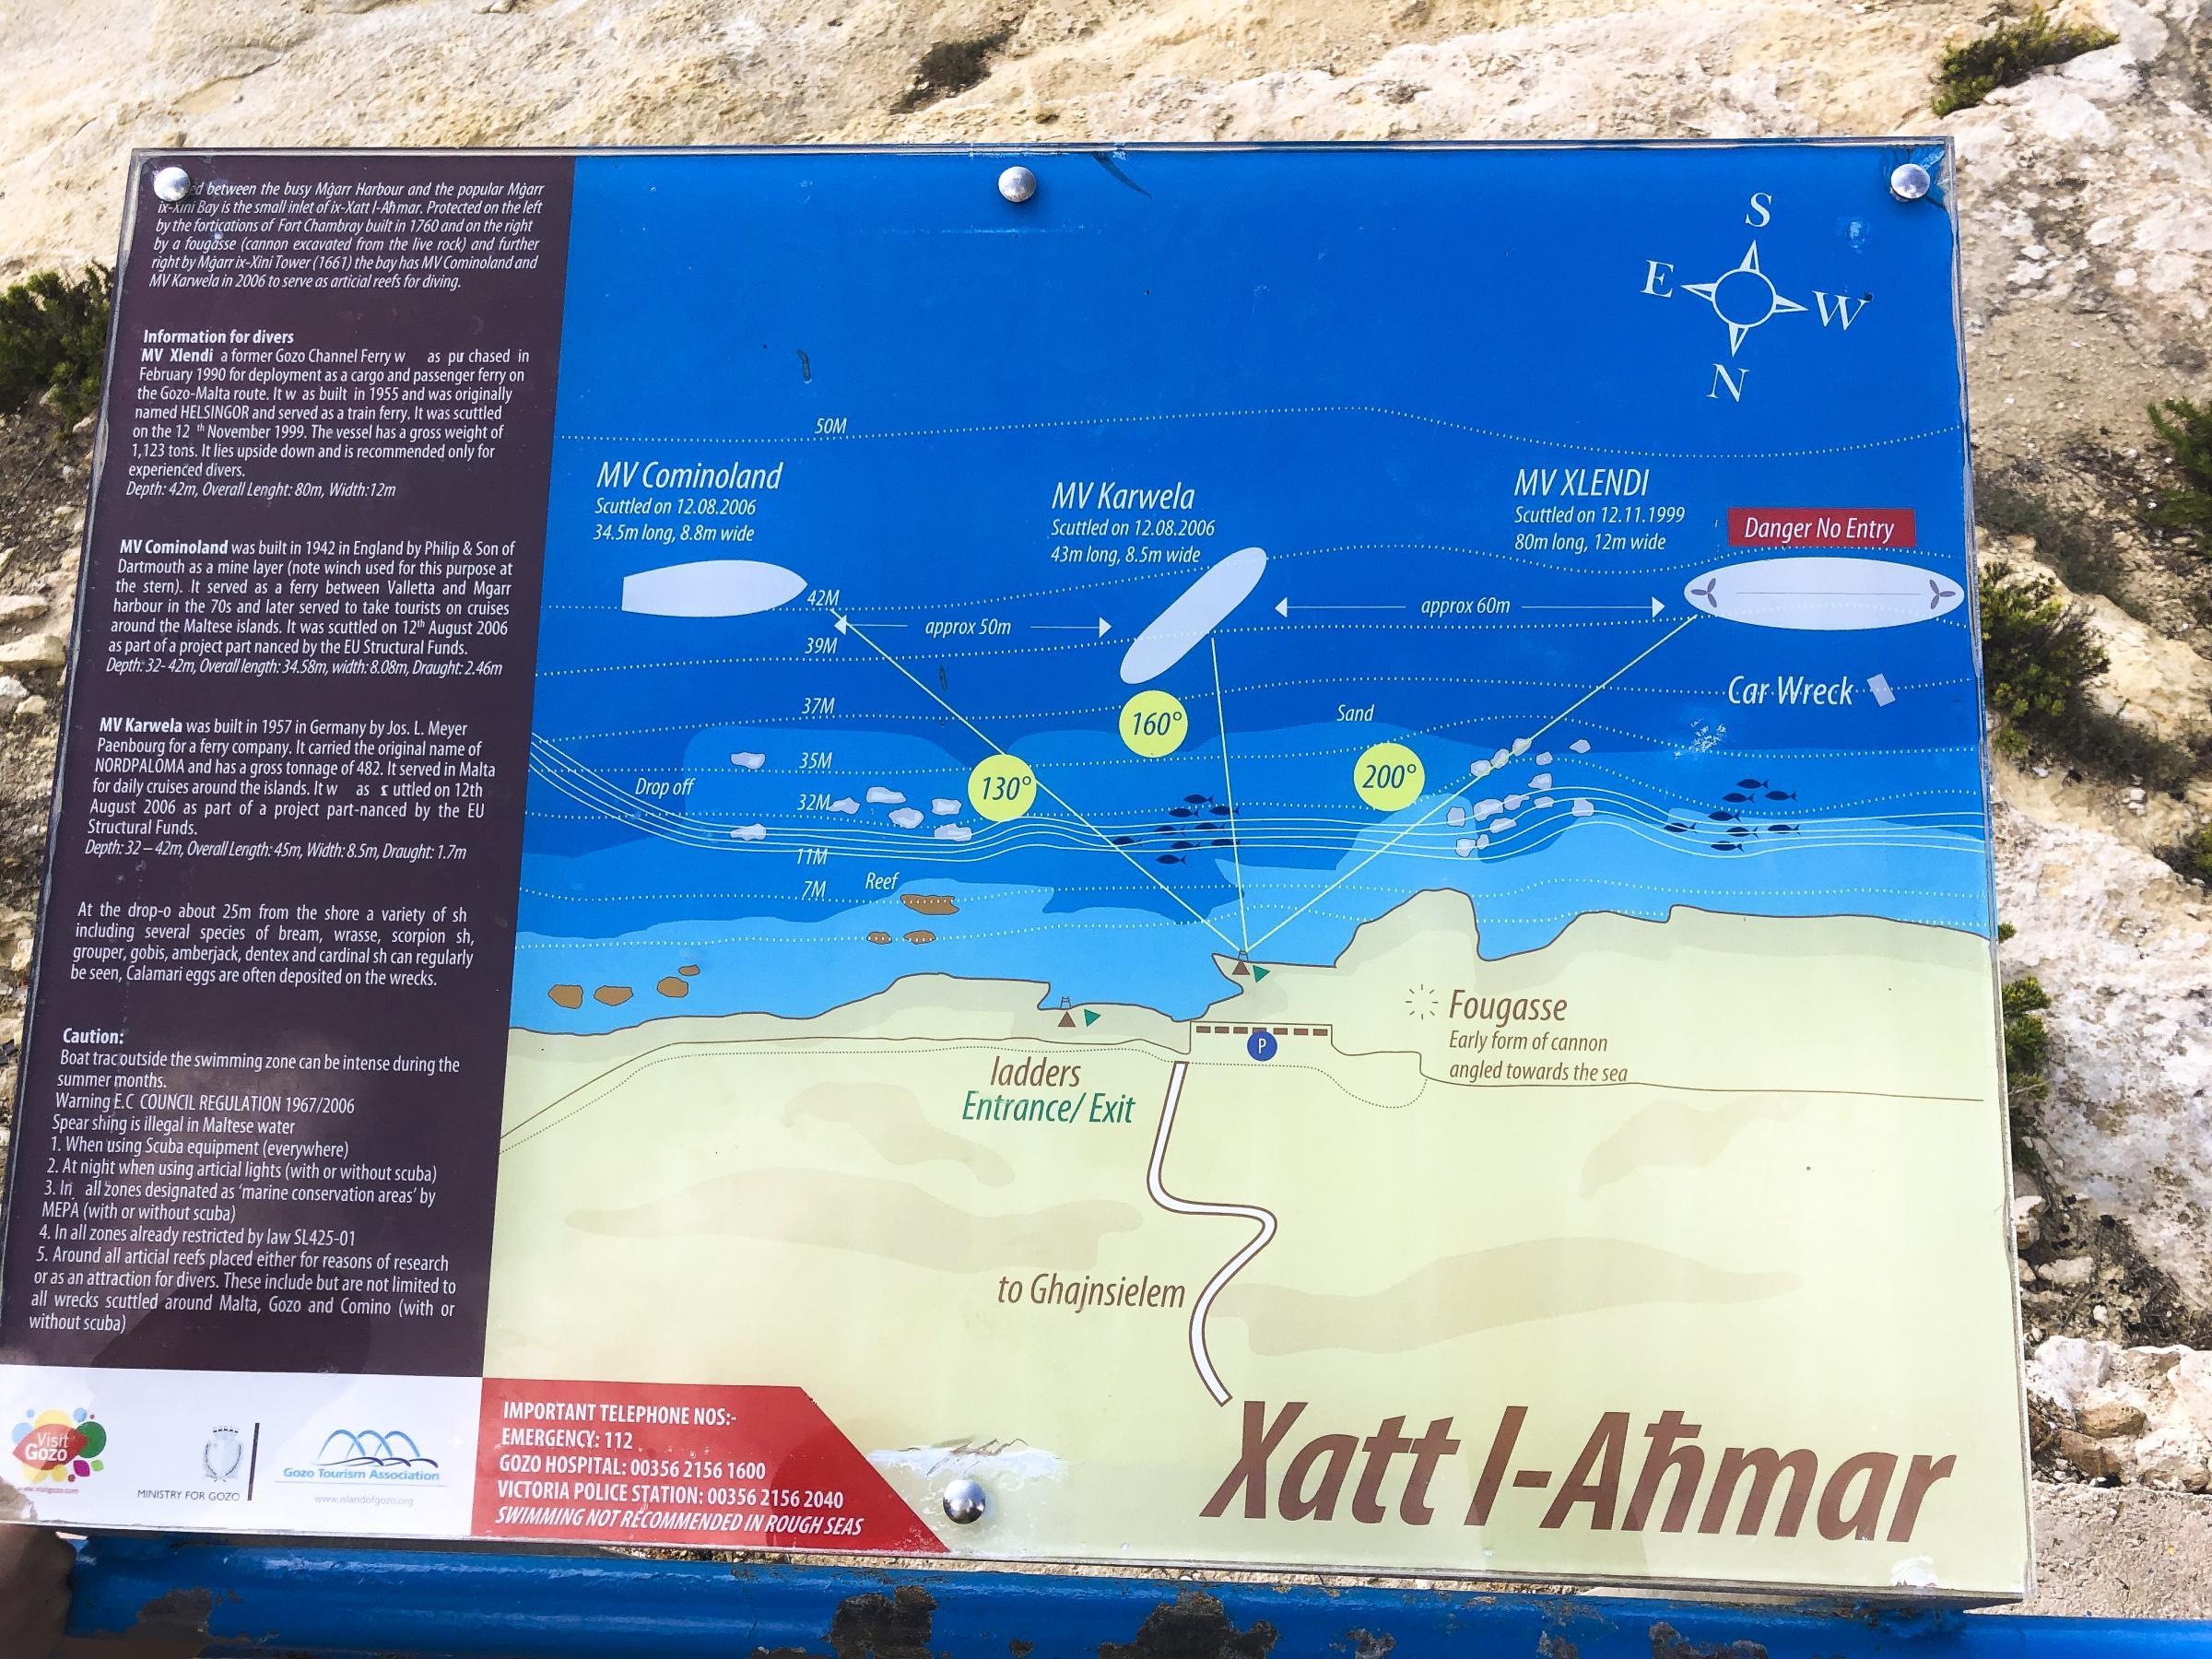 Map of Xatt l-Ahmar